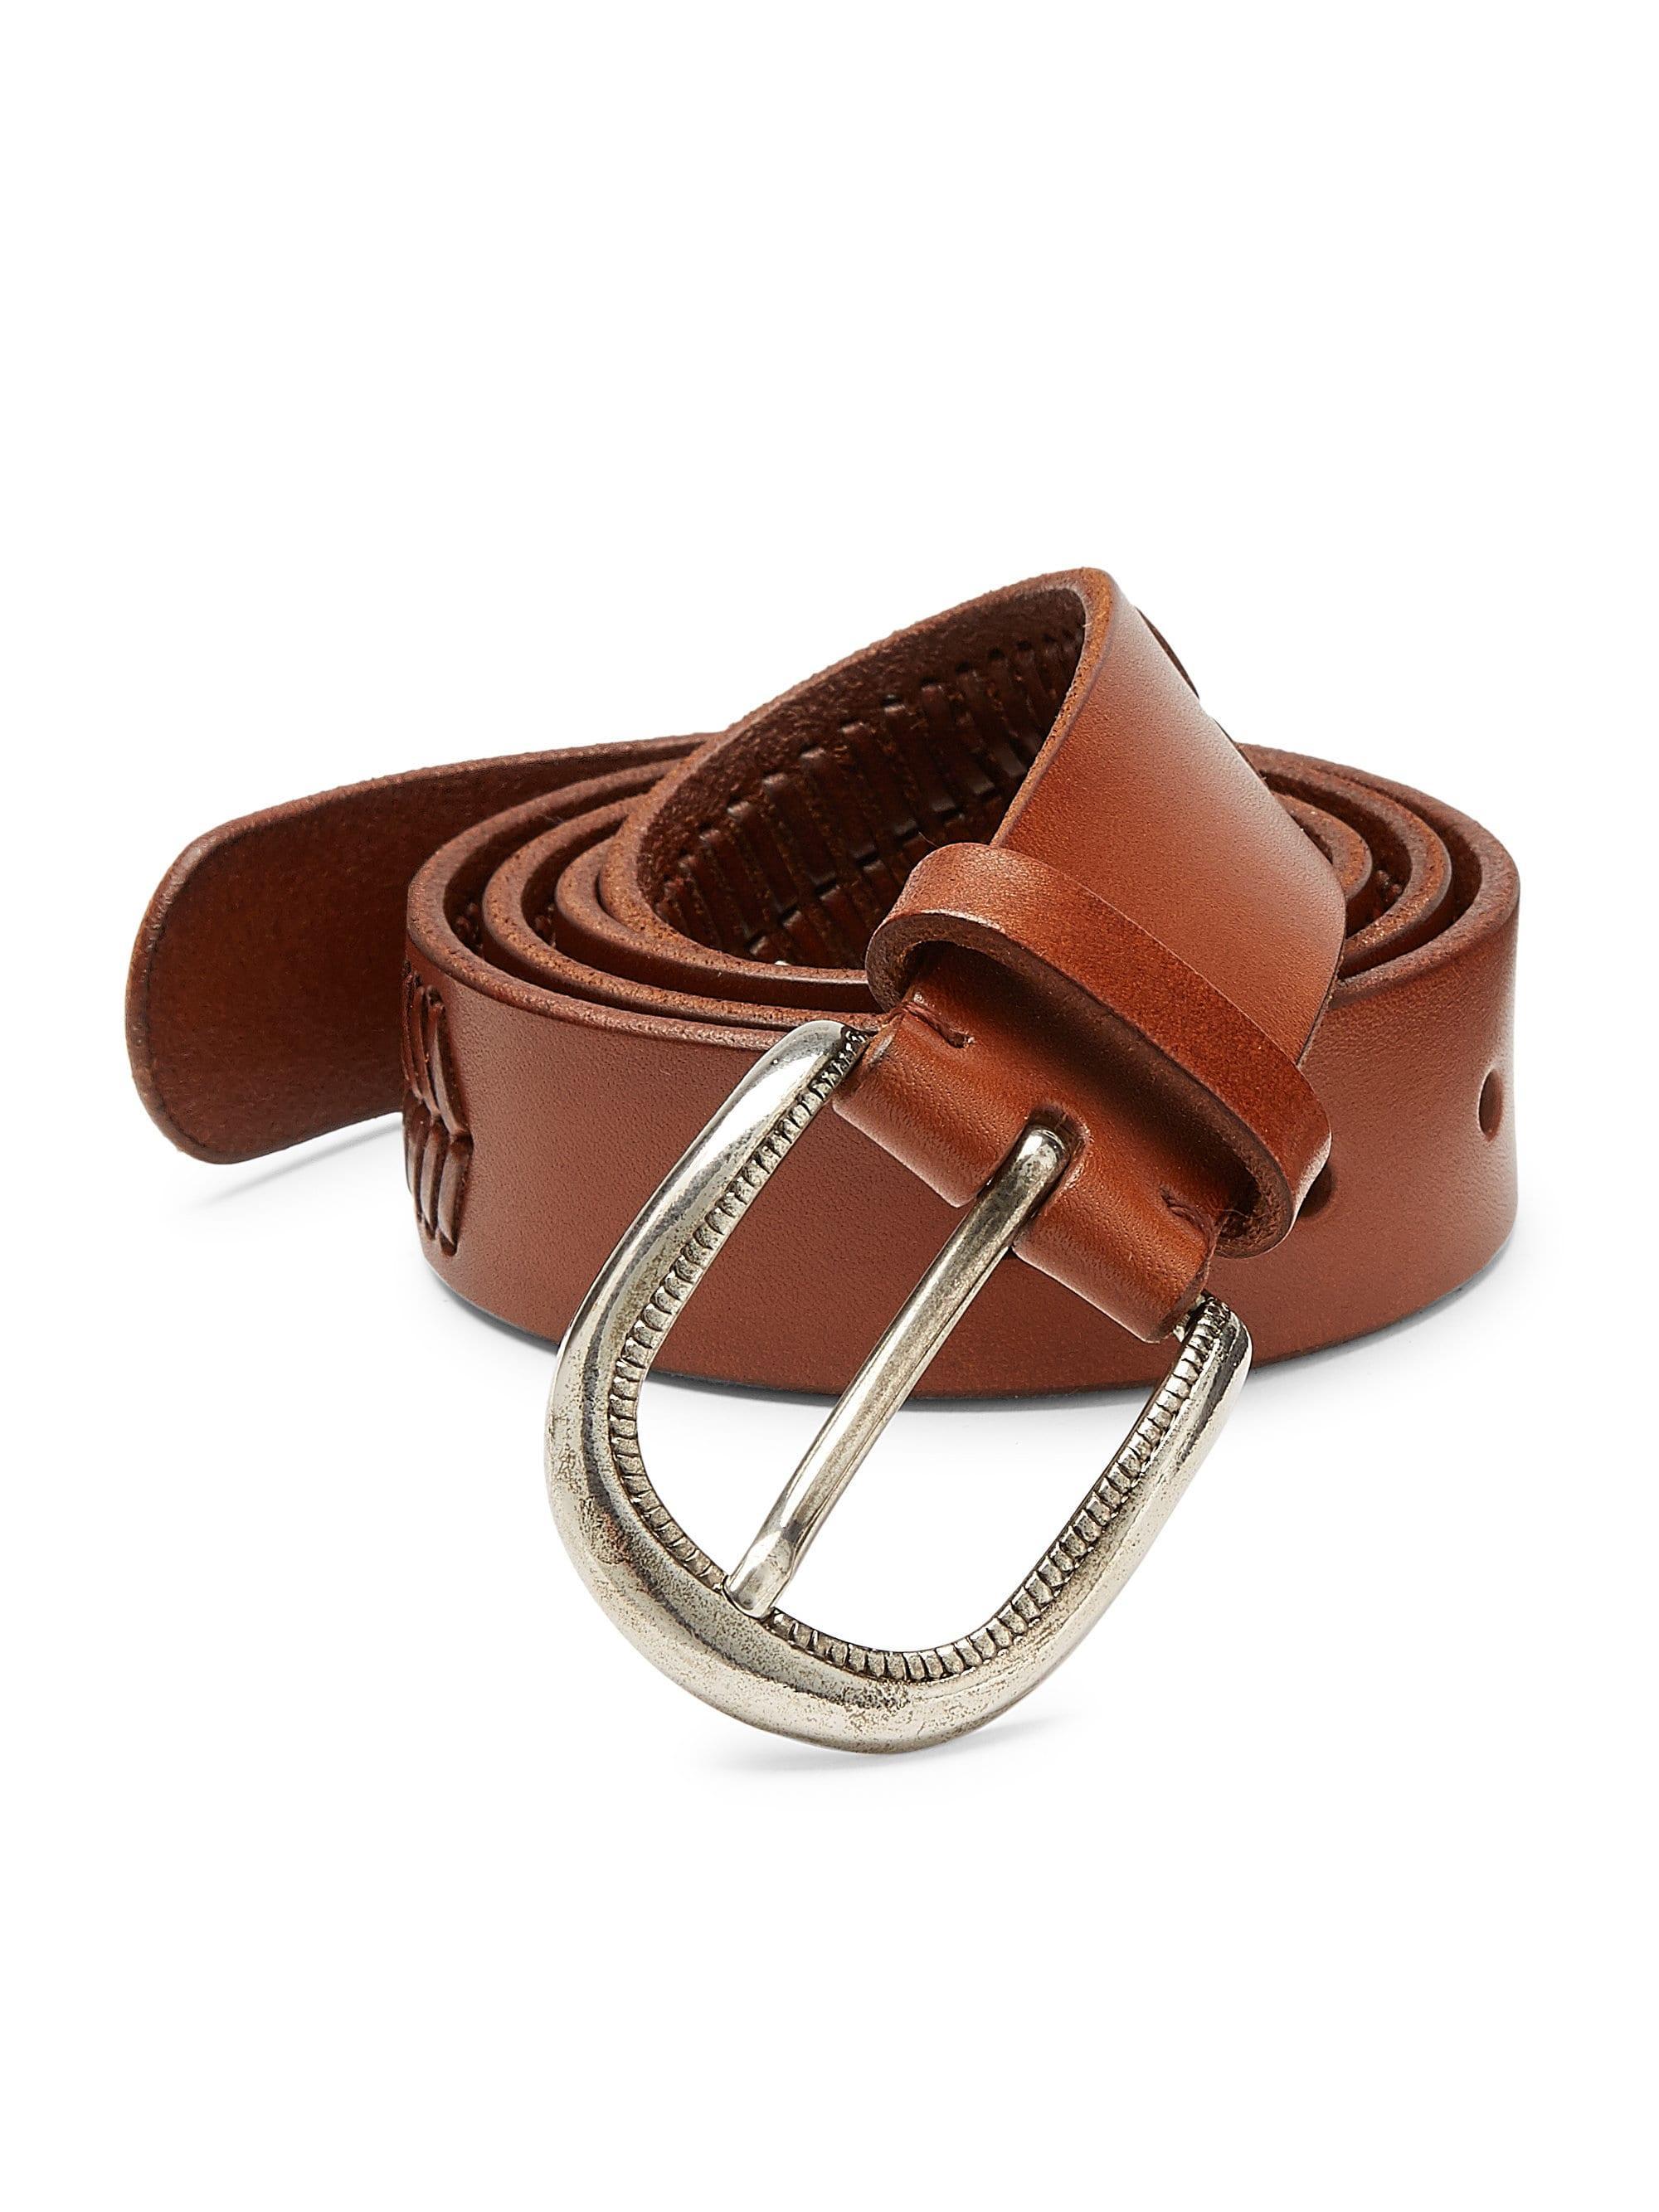 1aca3d58b20 Brunello Cucinelli - Brown Men s Leather Belt - Dark for Men - Lyst. View  fullscreen